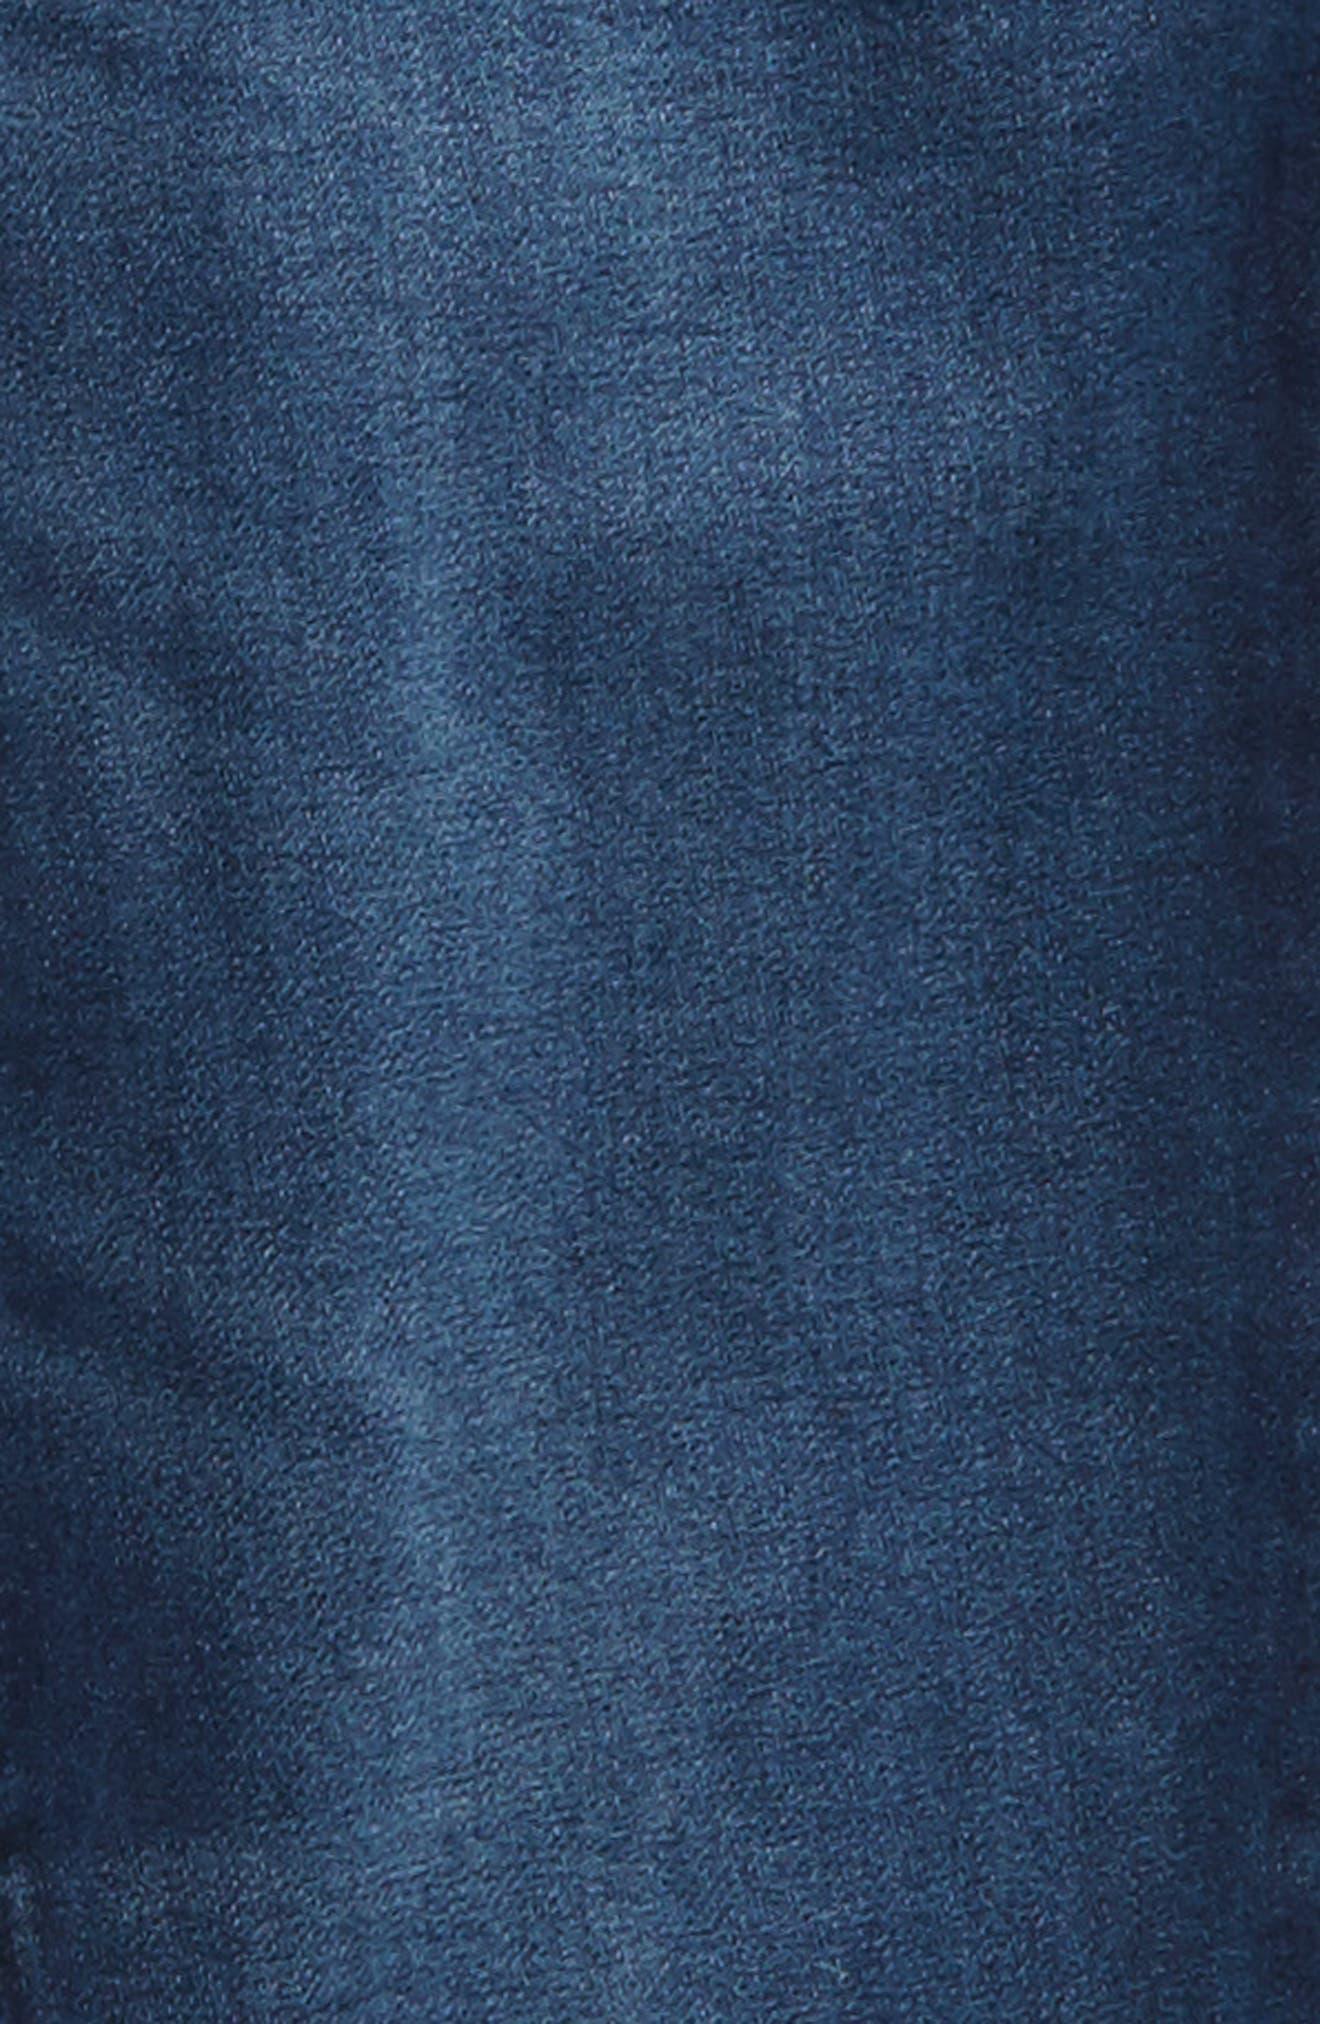 William Drawstring Jeans,                             Alternate thumbnail 3, color,                             Reserve